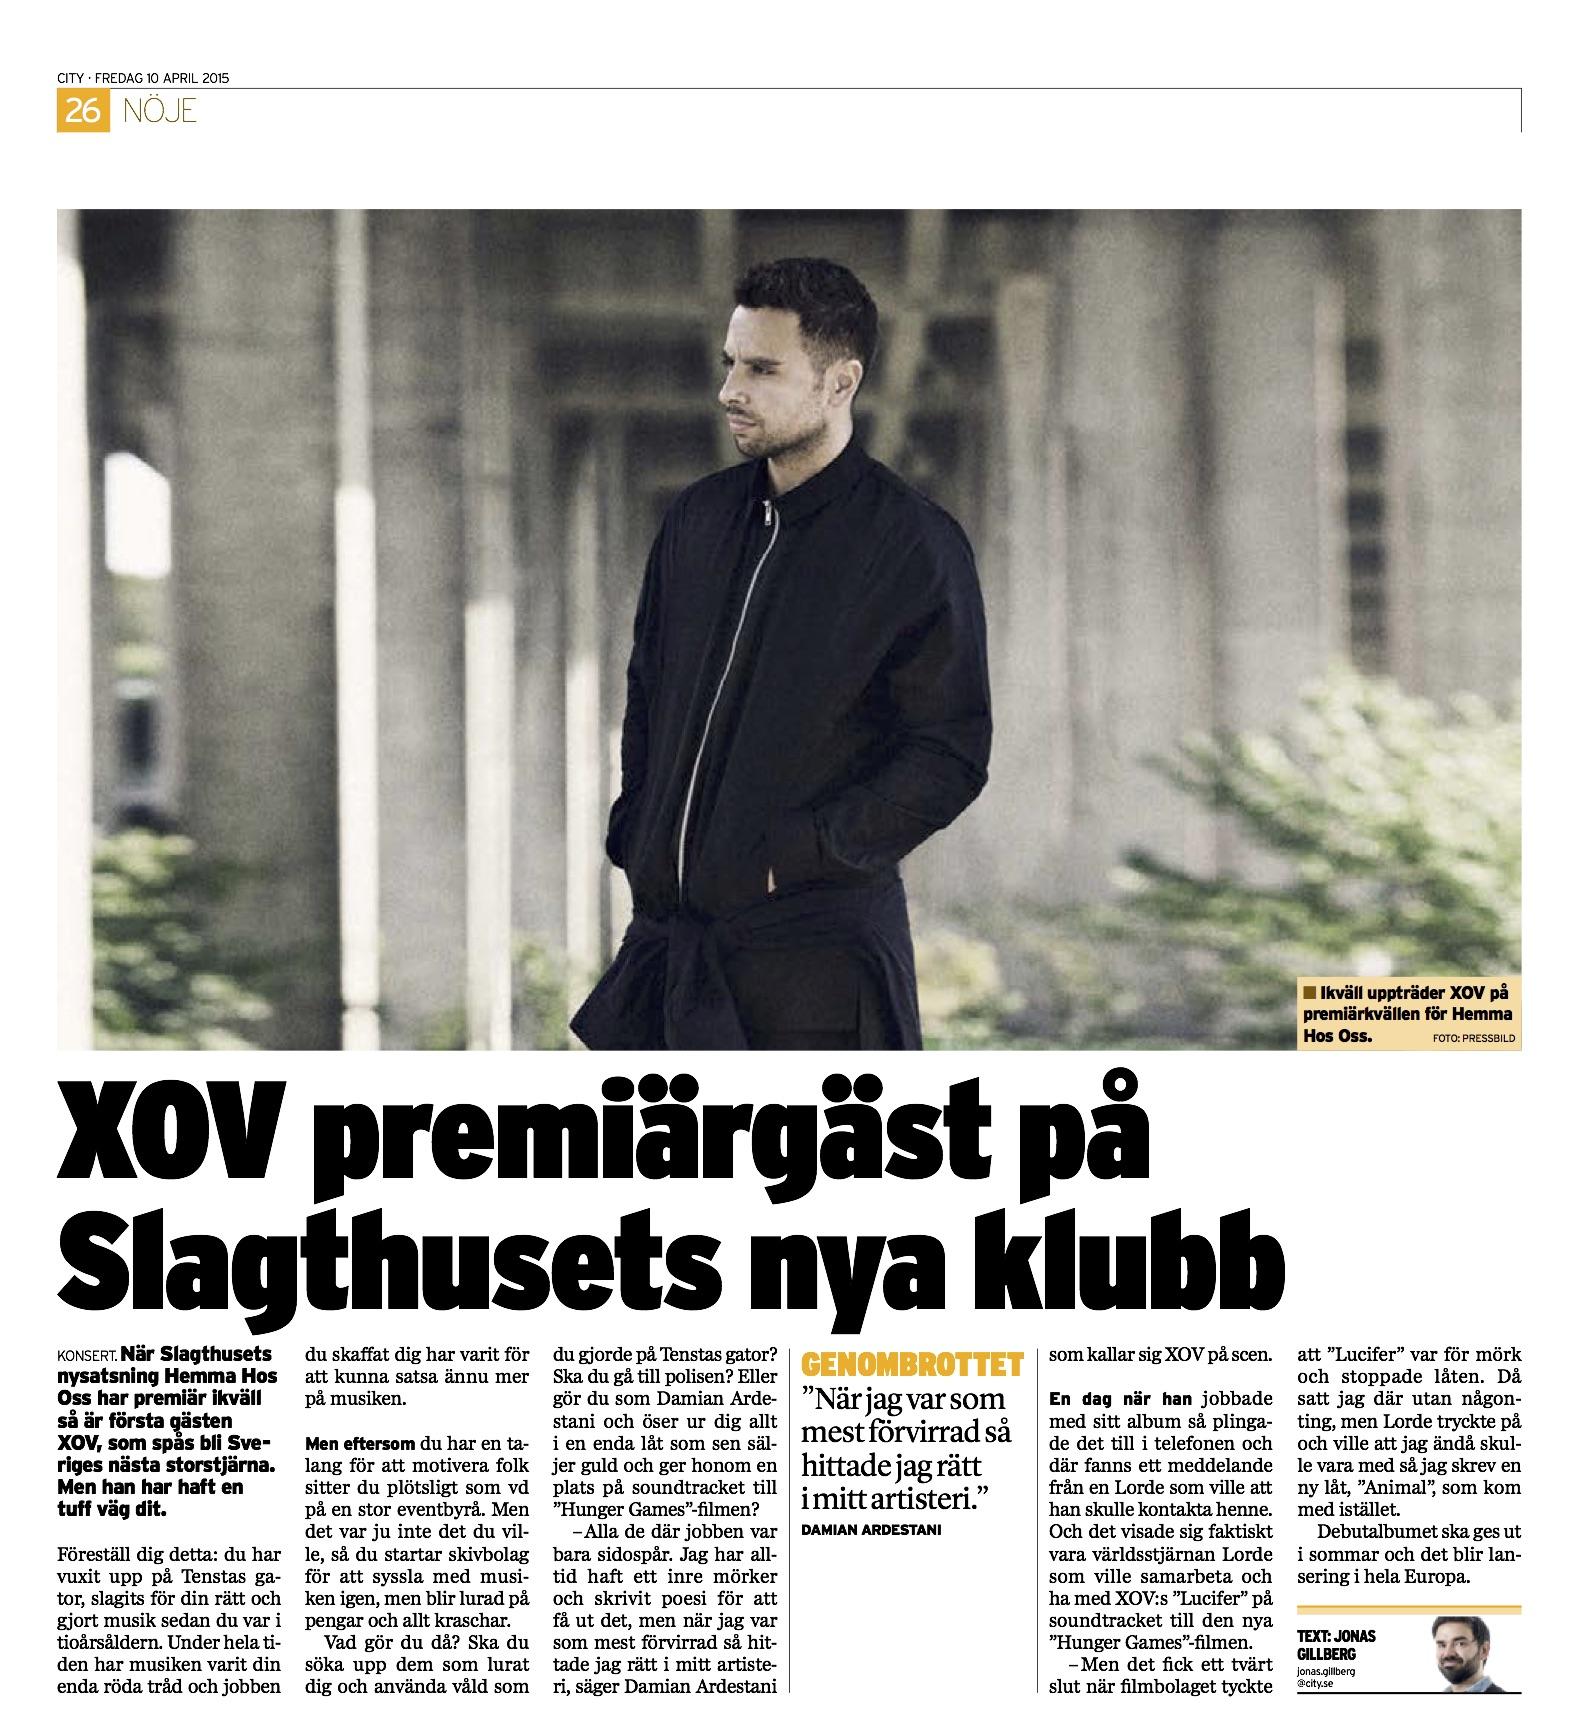 CIty tidning intervju - XOV .jpg